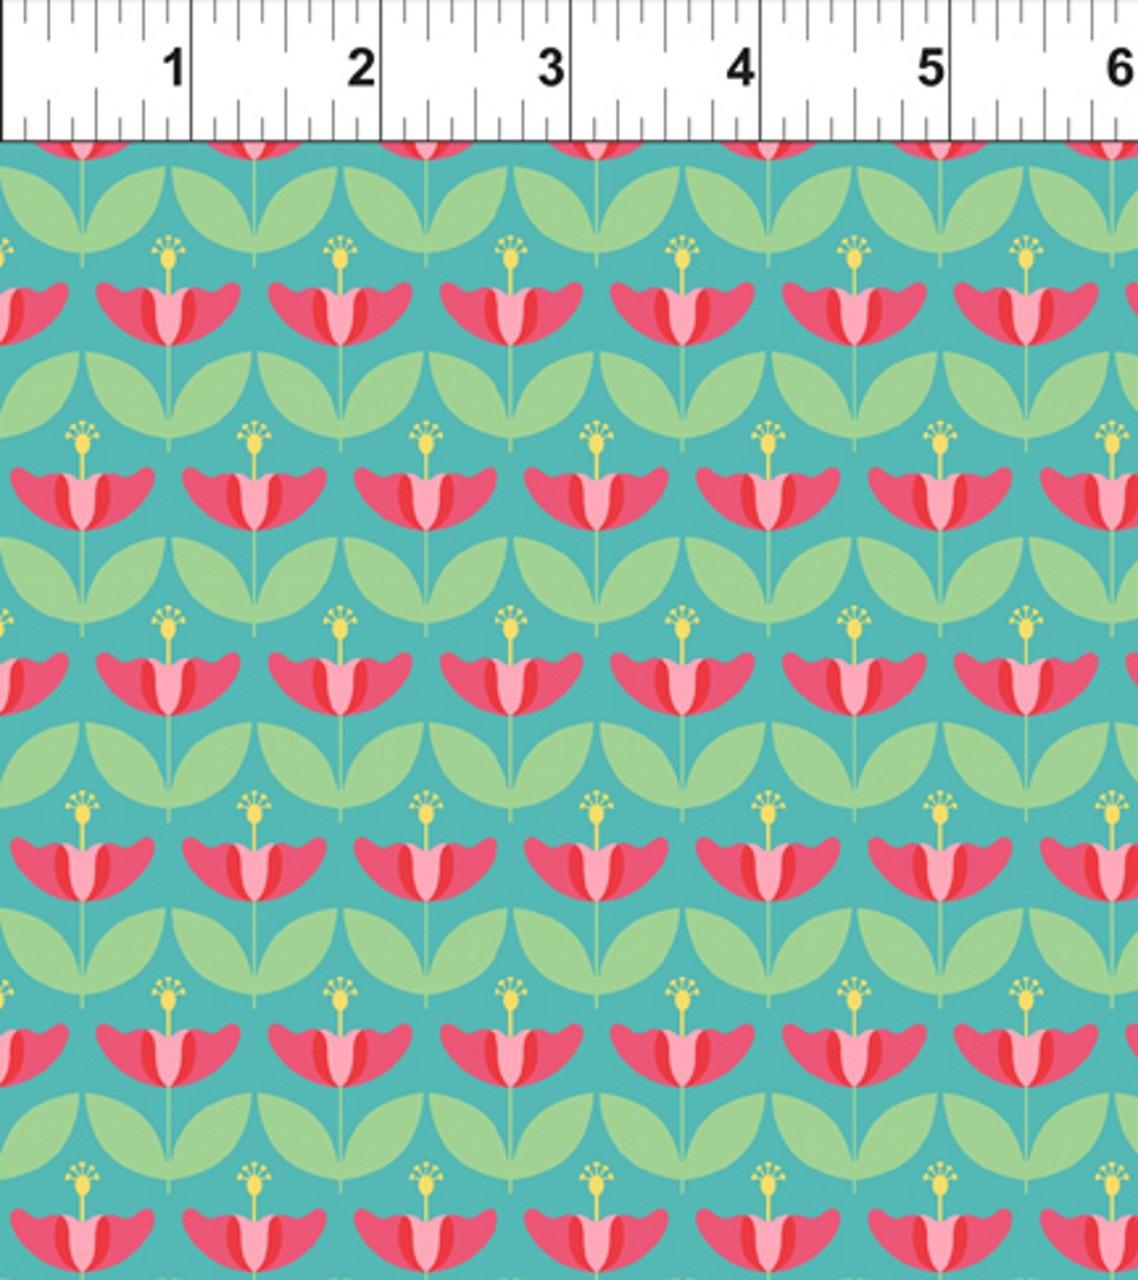 ART DECO HAWAII STATE FLOWER FABRIC   IBFDES11DSF1 HAWAII   Deco